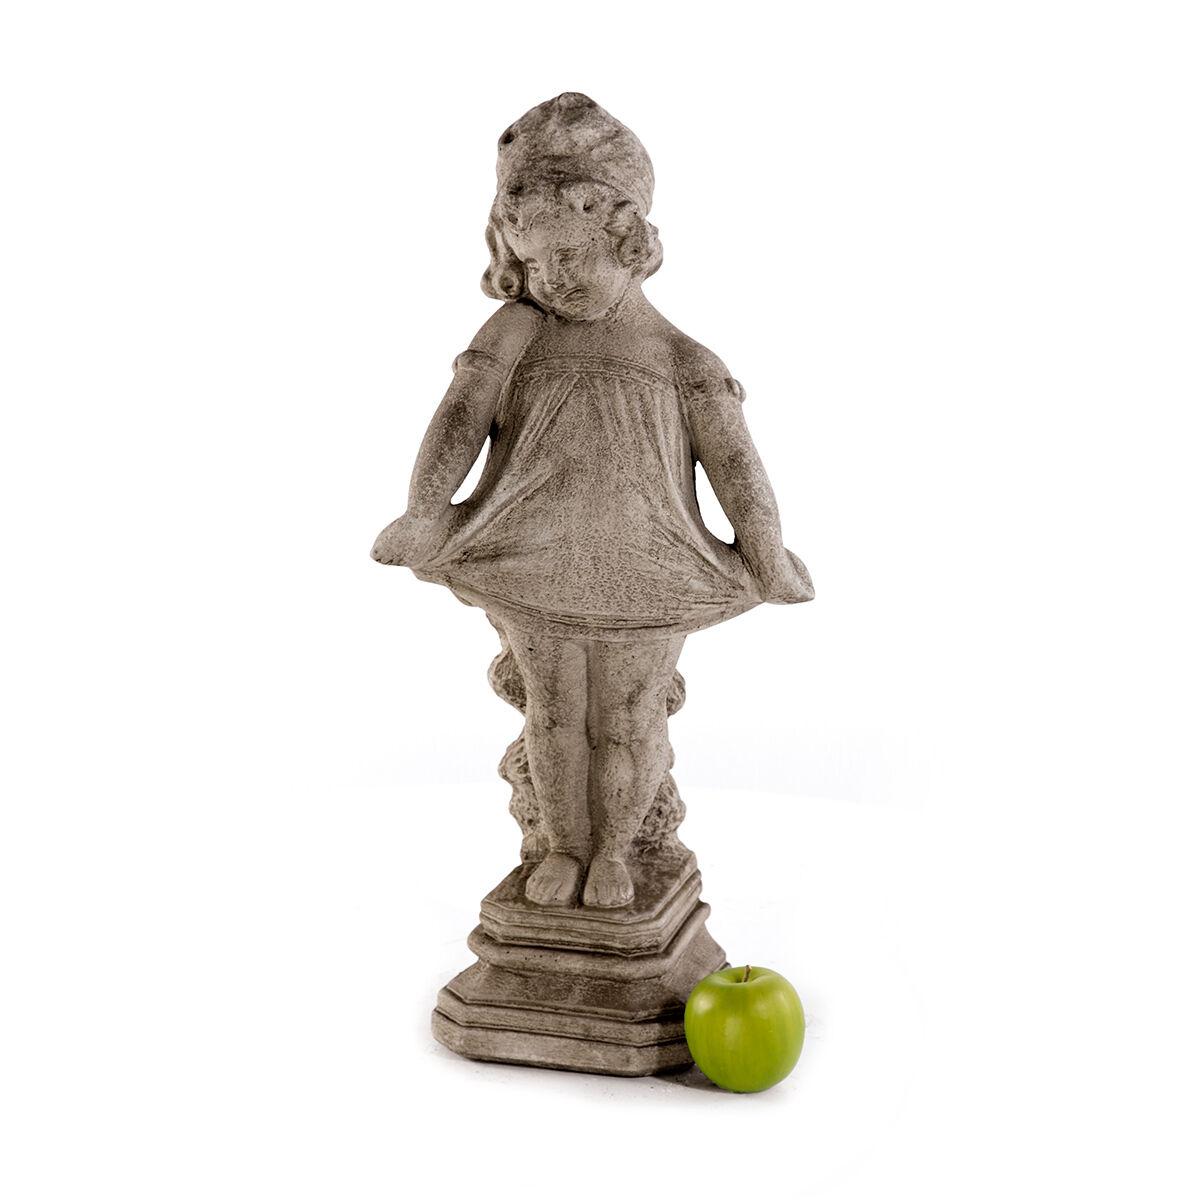 Jardin Personnage Pierre personnage Dekofigur 60 cm 14,5 kg fille Steinguss statue sculpture